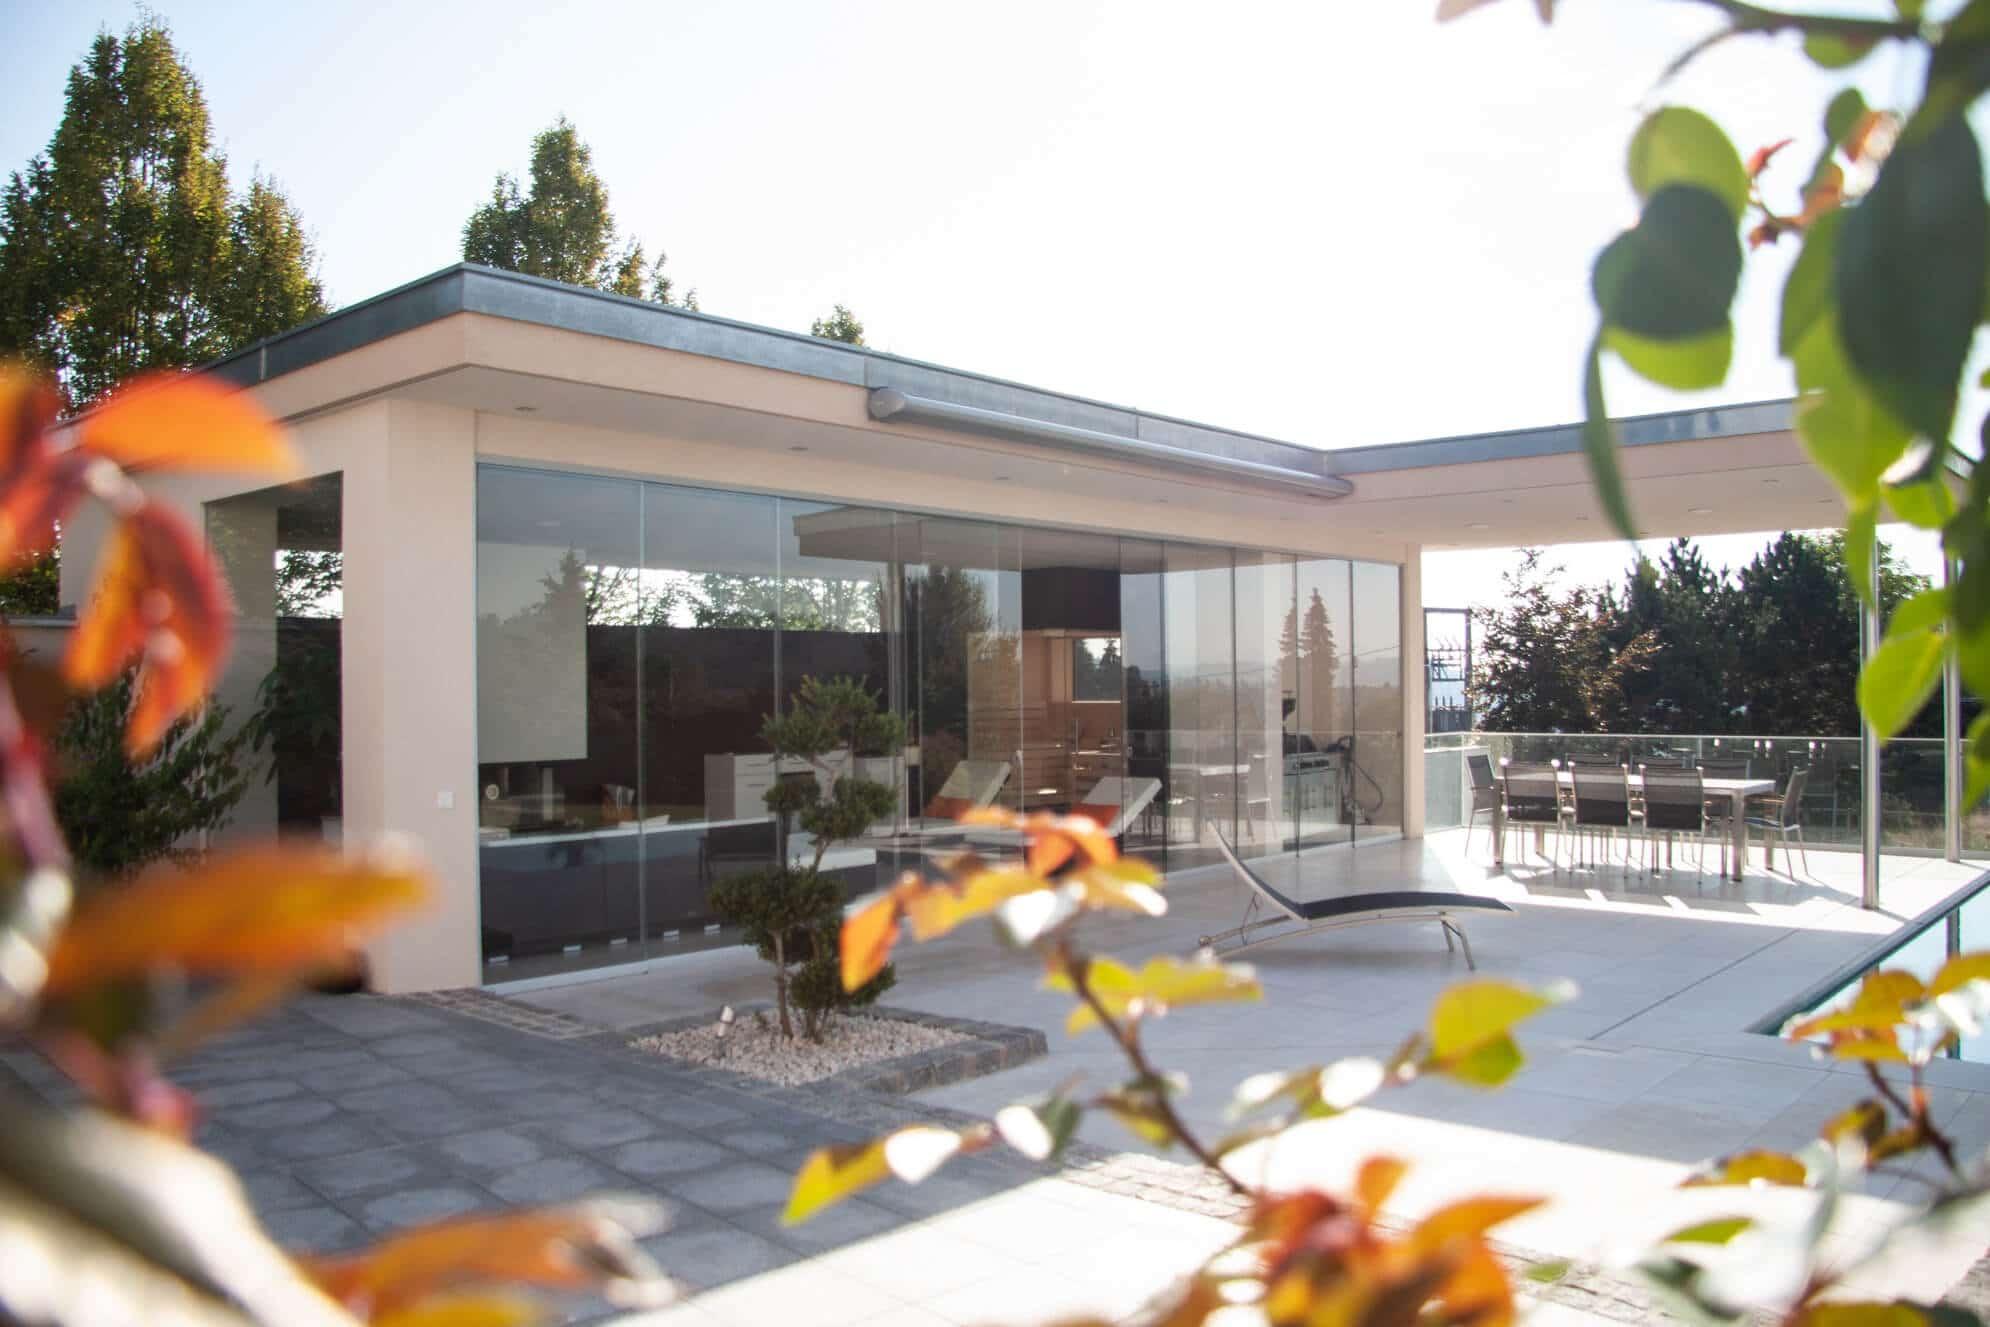 sunflex glasschiebewand f r wintergarten wintergarten schmidinger. Black Bedroom Furniture Sets. Home Design Ideas